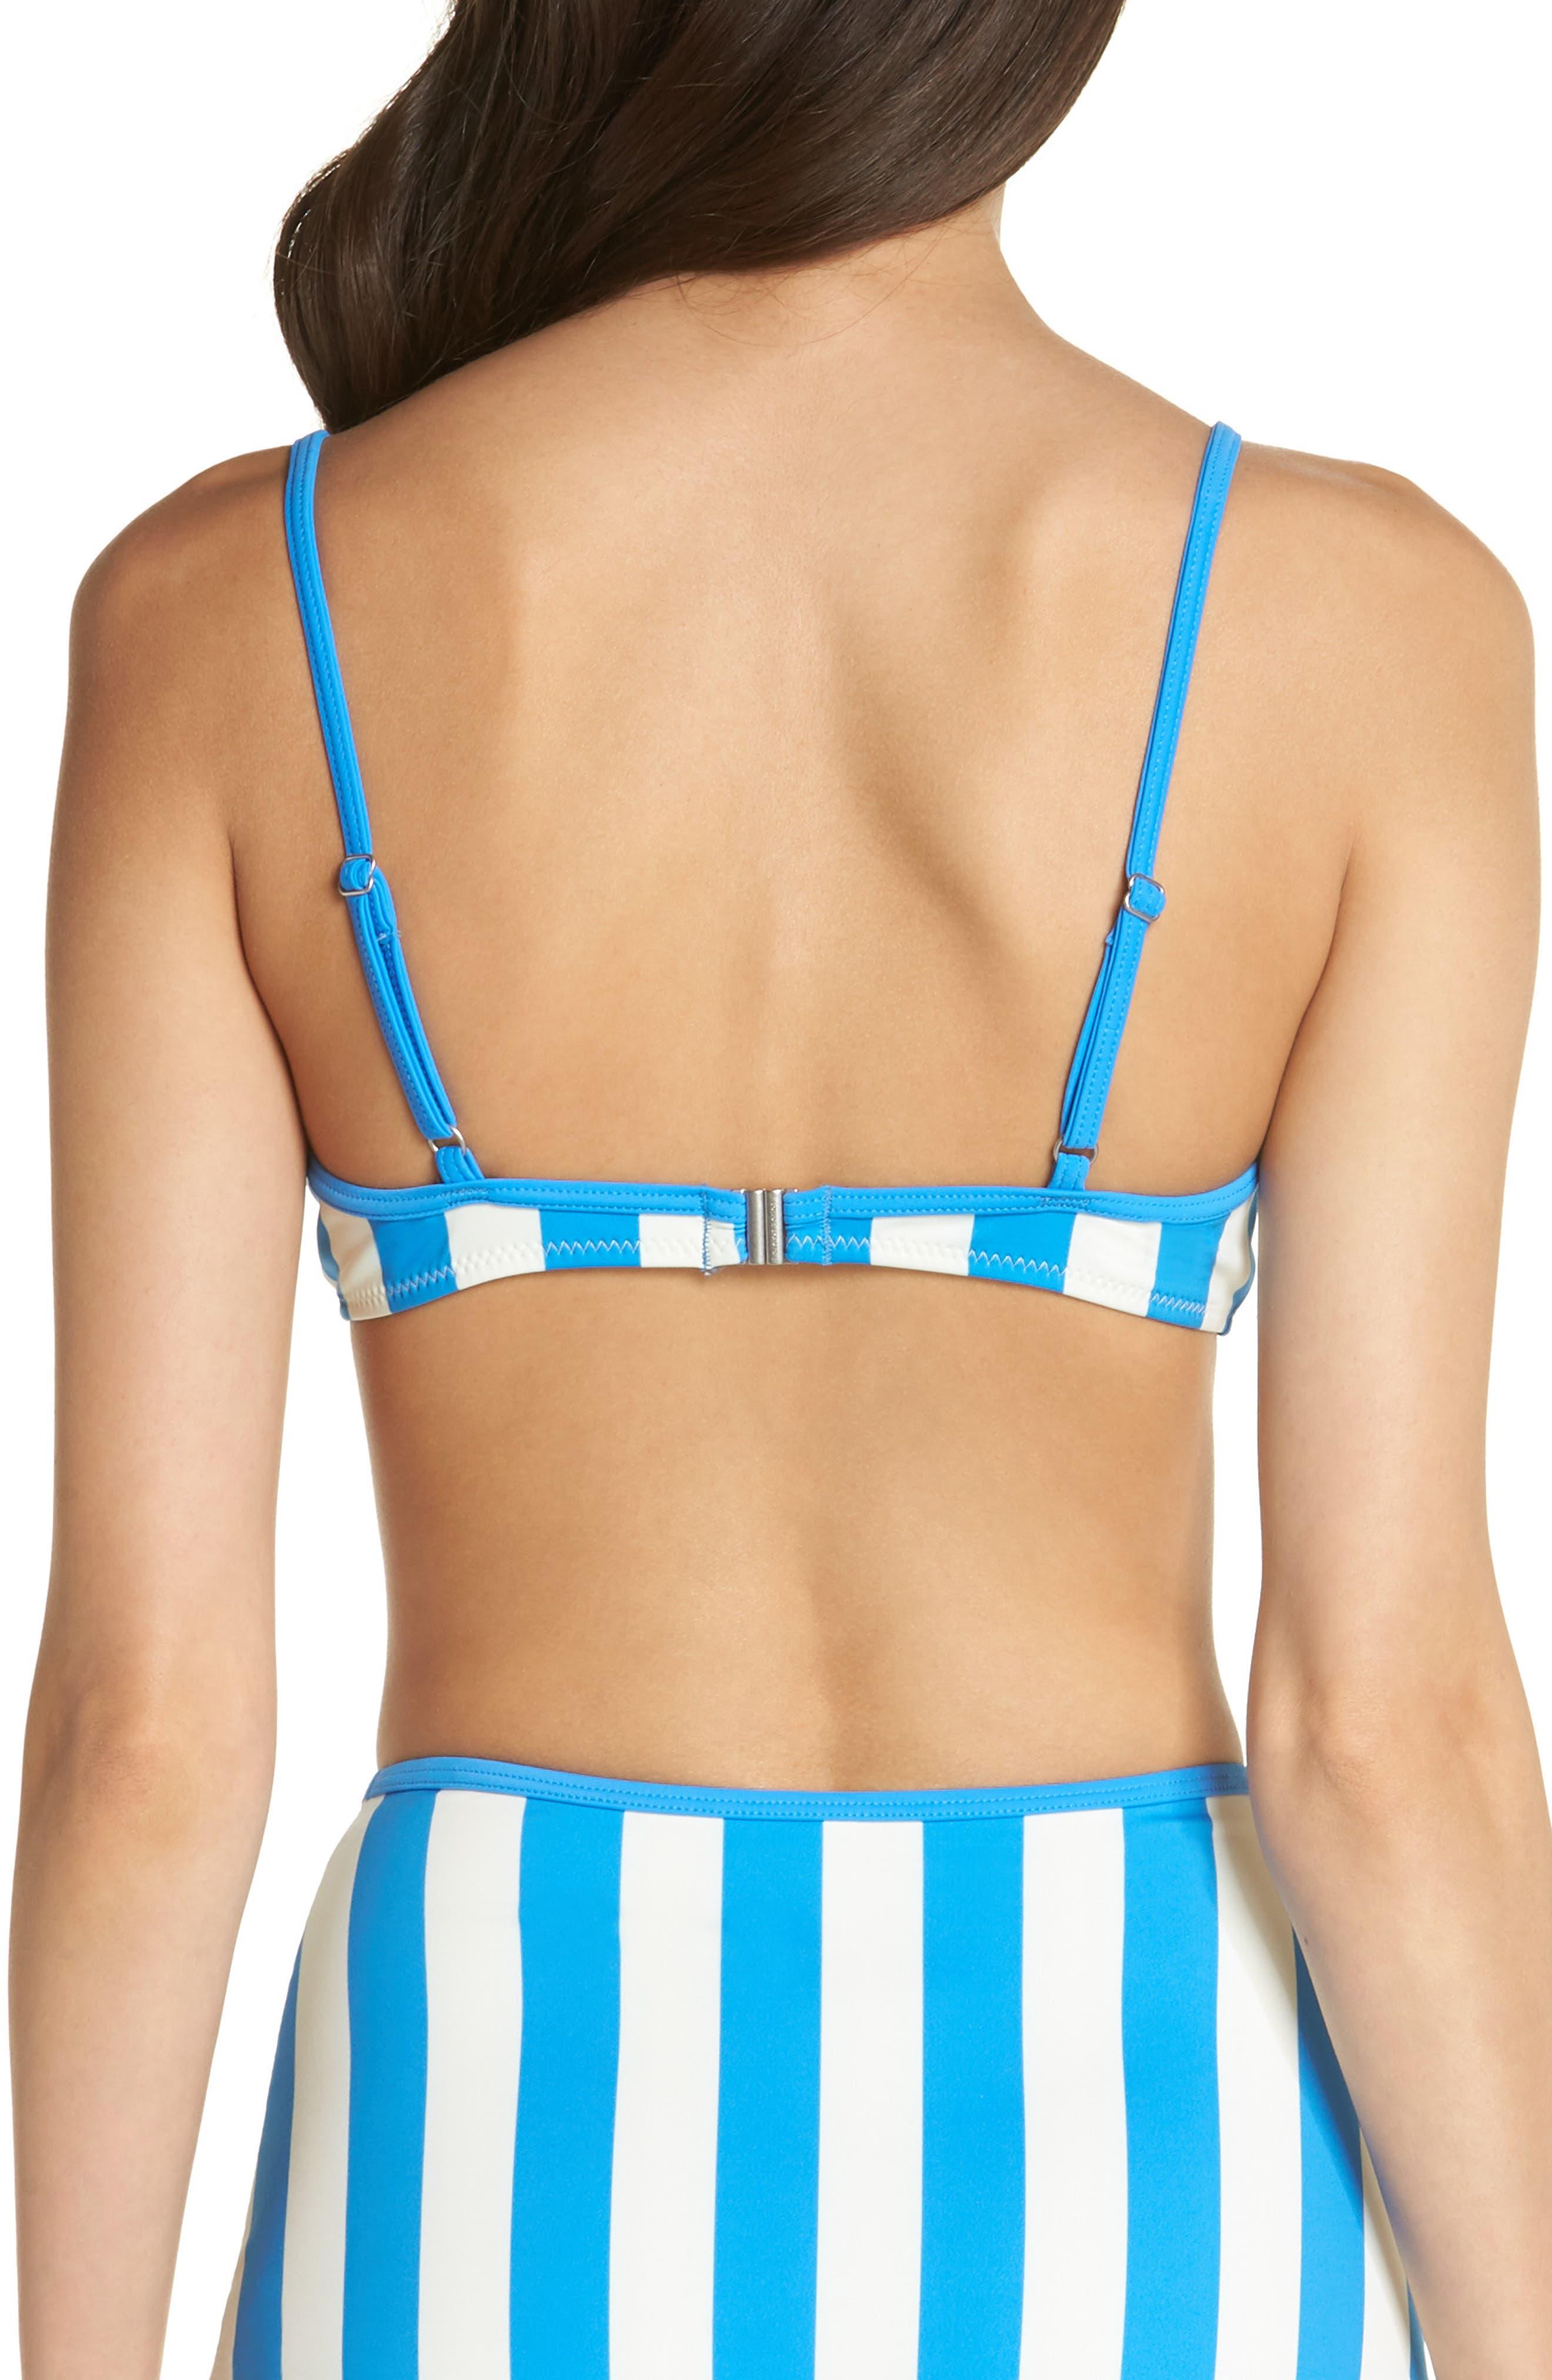 Billabong Brigitte Bikini Top,                             Alternate thumbnail 2, color,                             Sea Stripe